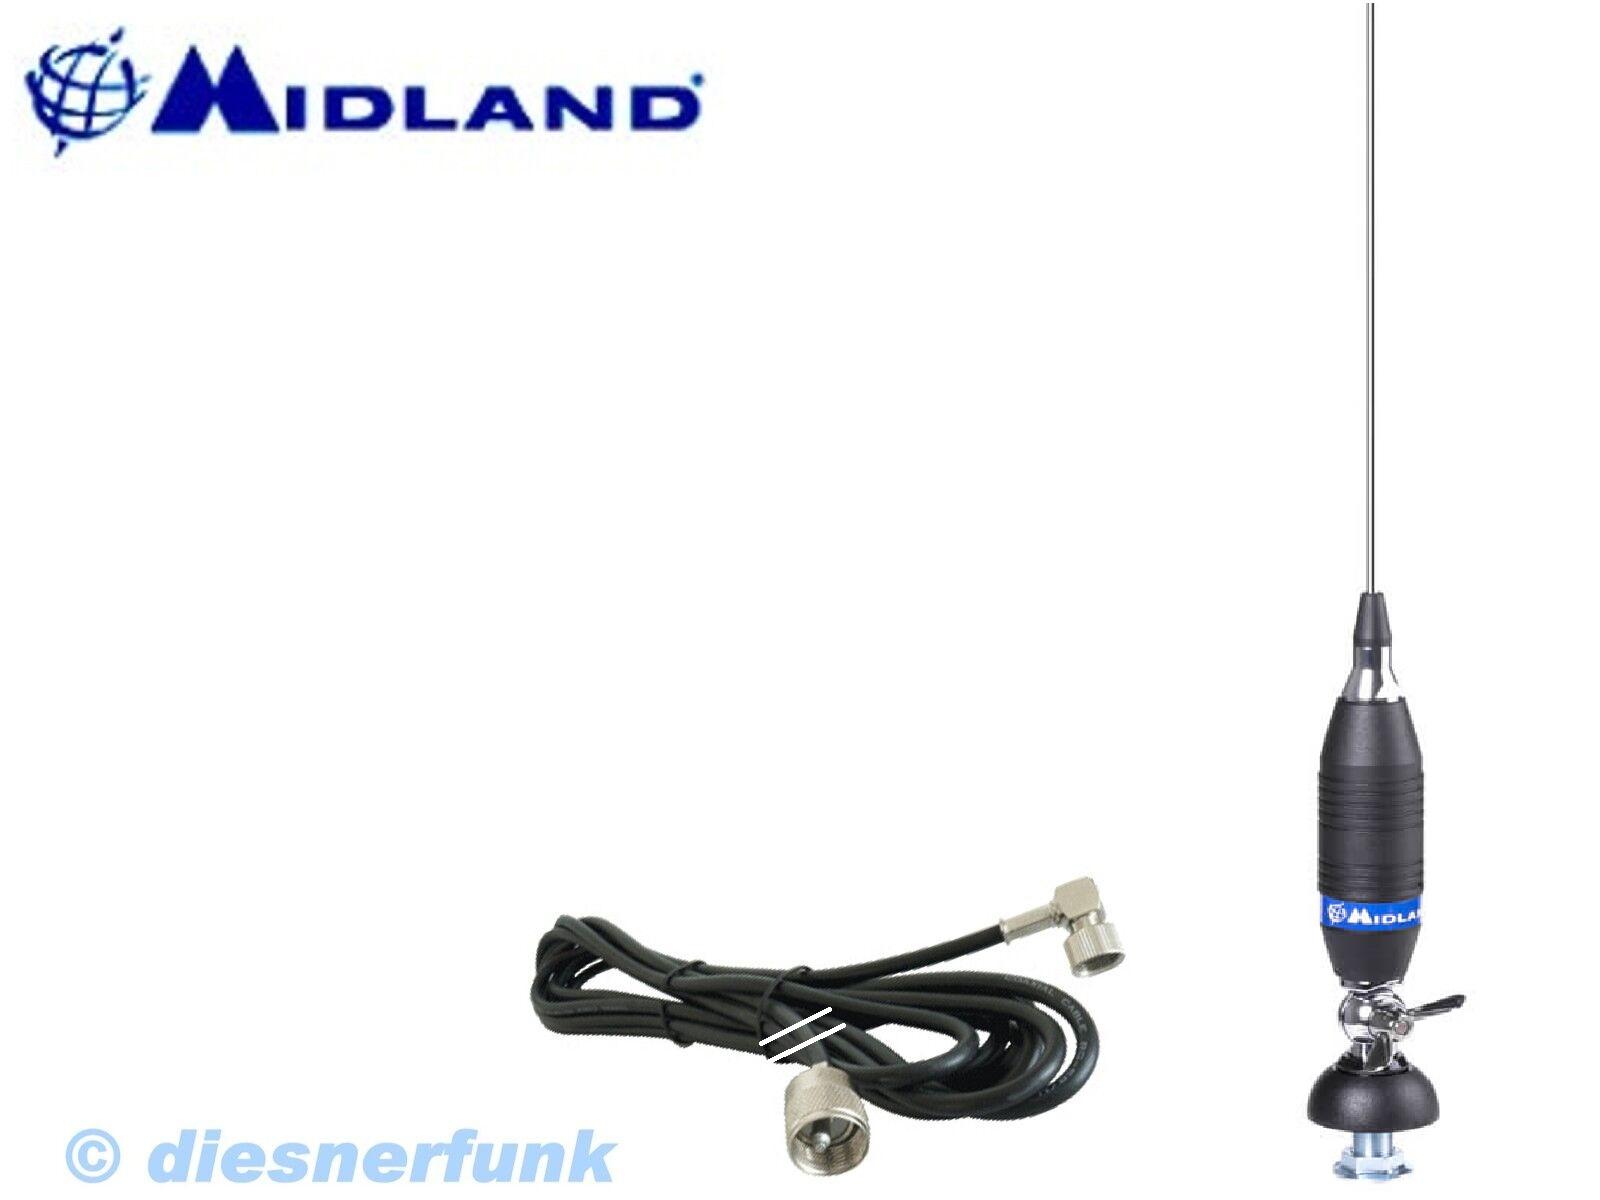 cb funk antenne top midland alan funk 150 200watt 150cm. Black Bedroom Furniture Sets. Home Design Ideas